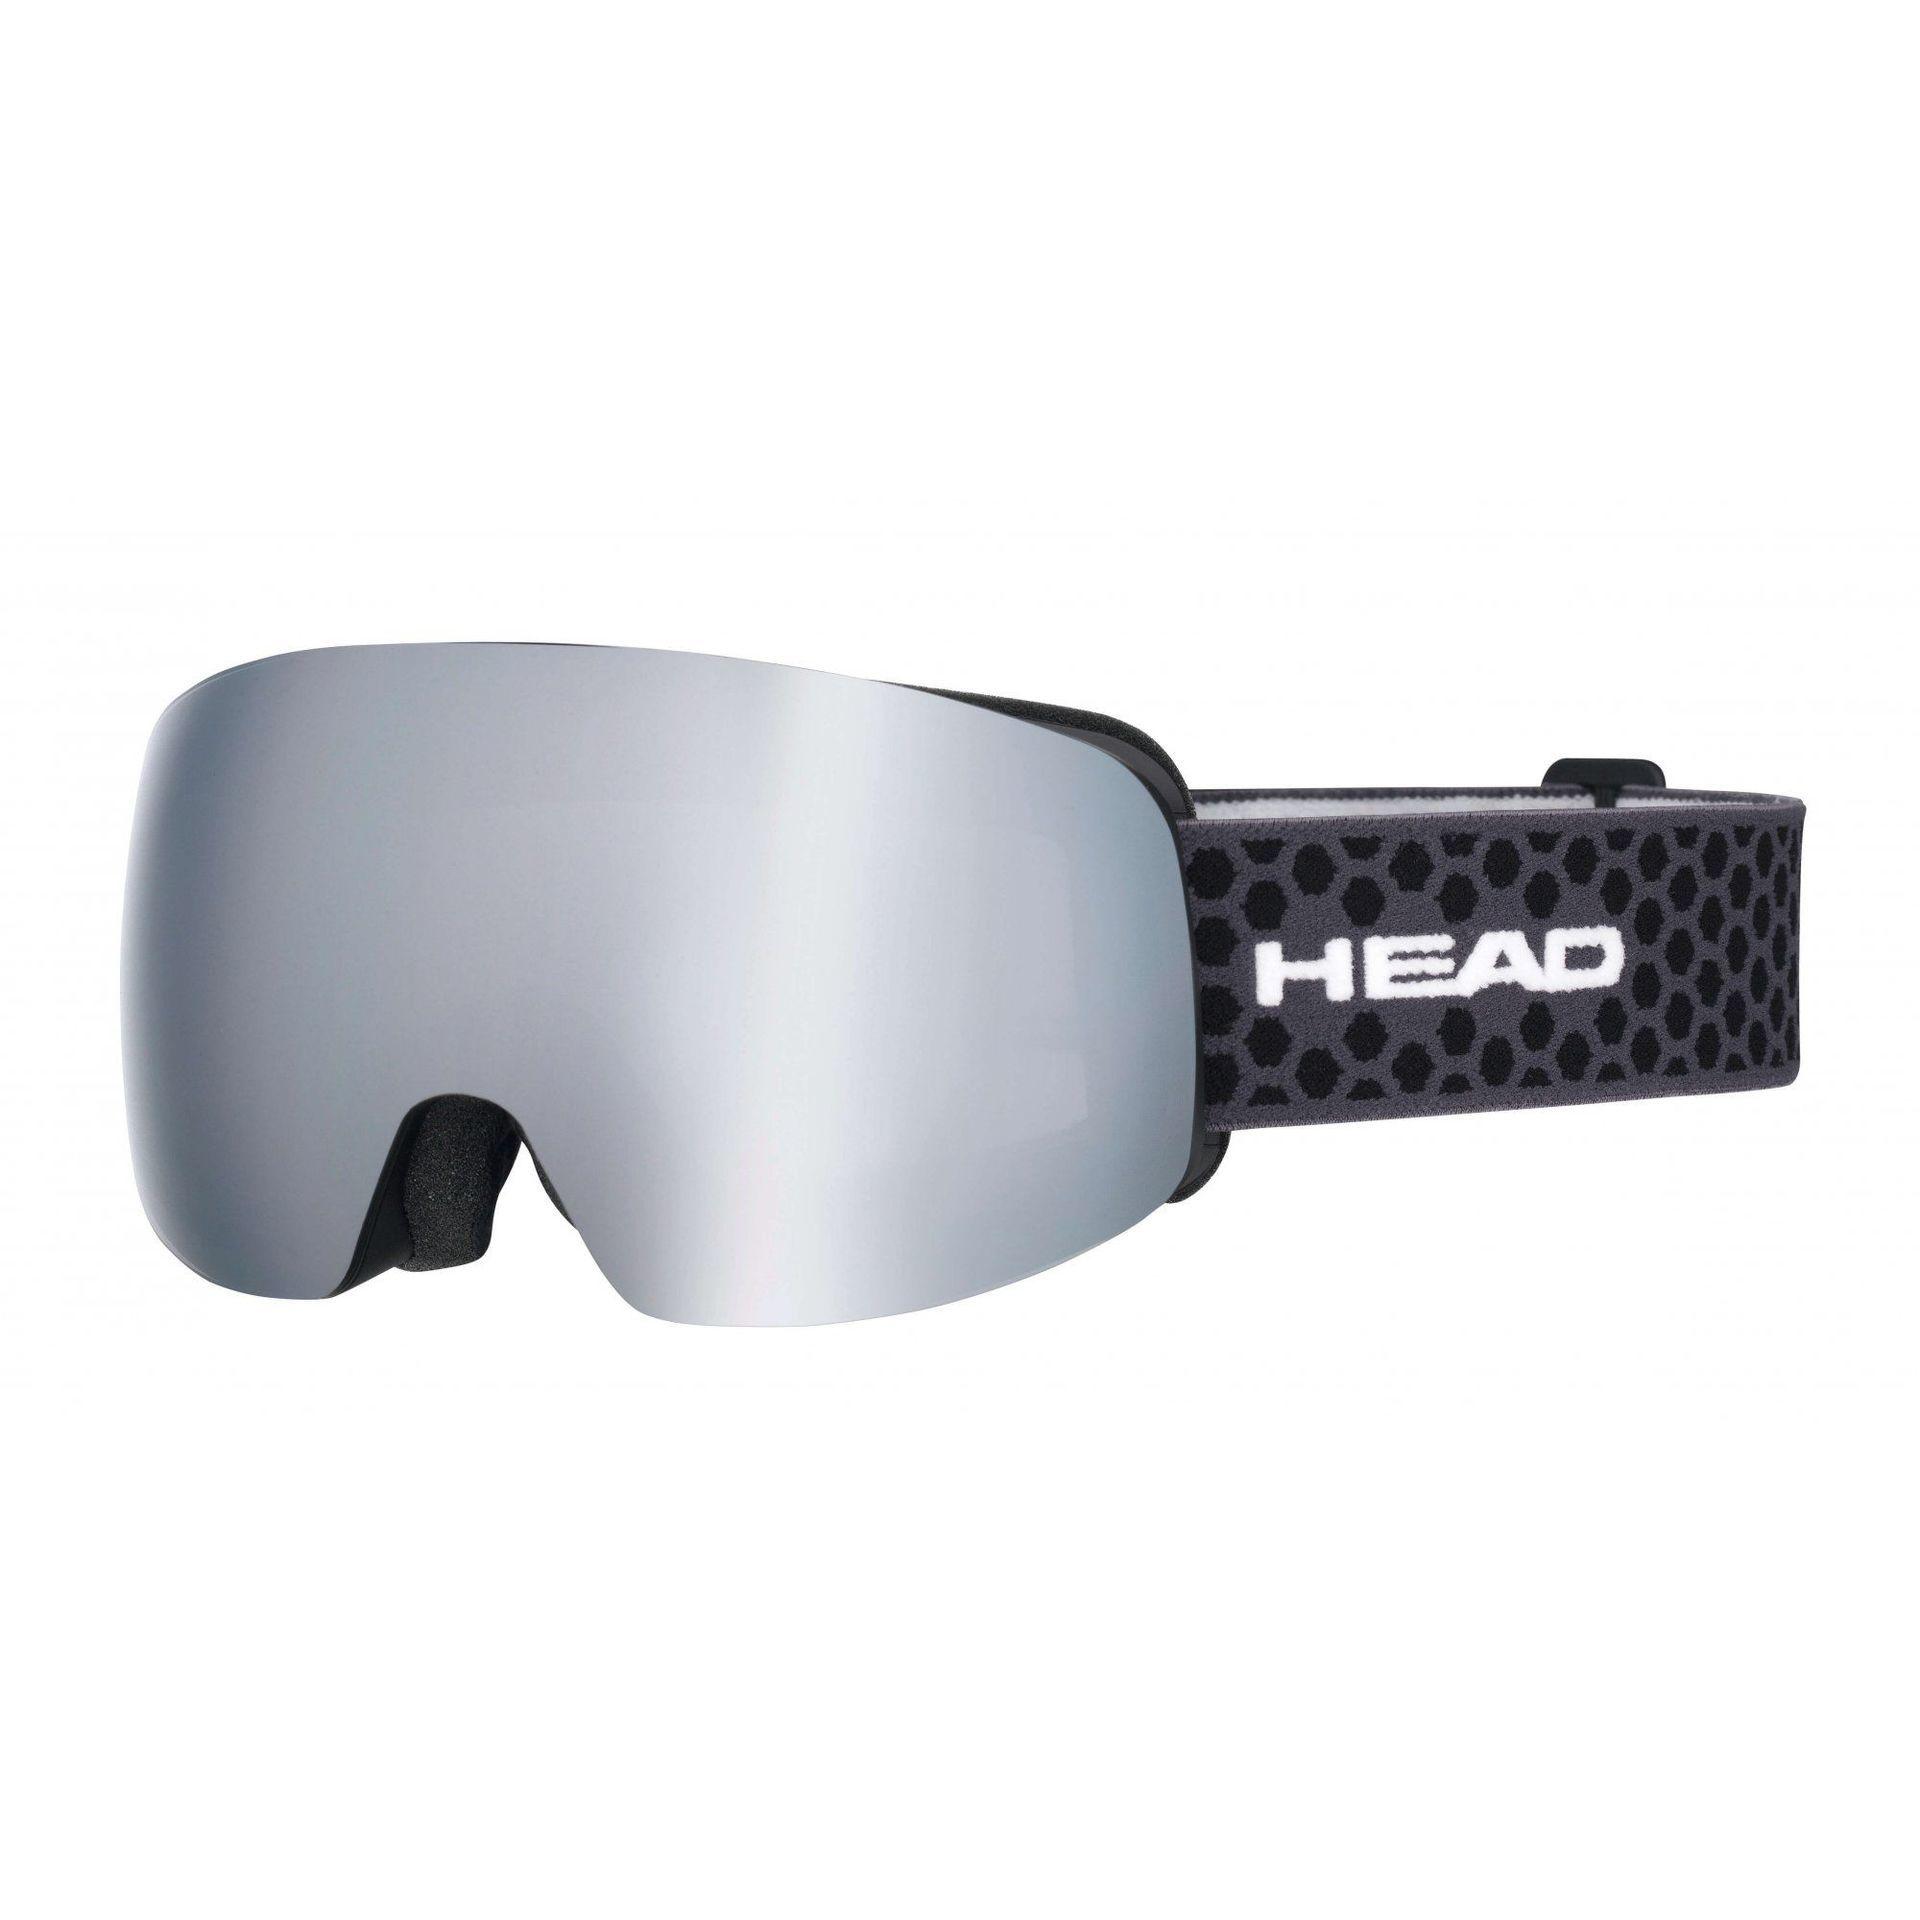 GOGLE HEAD GALACTIC FMR 392217